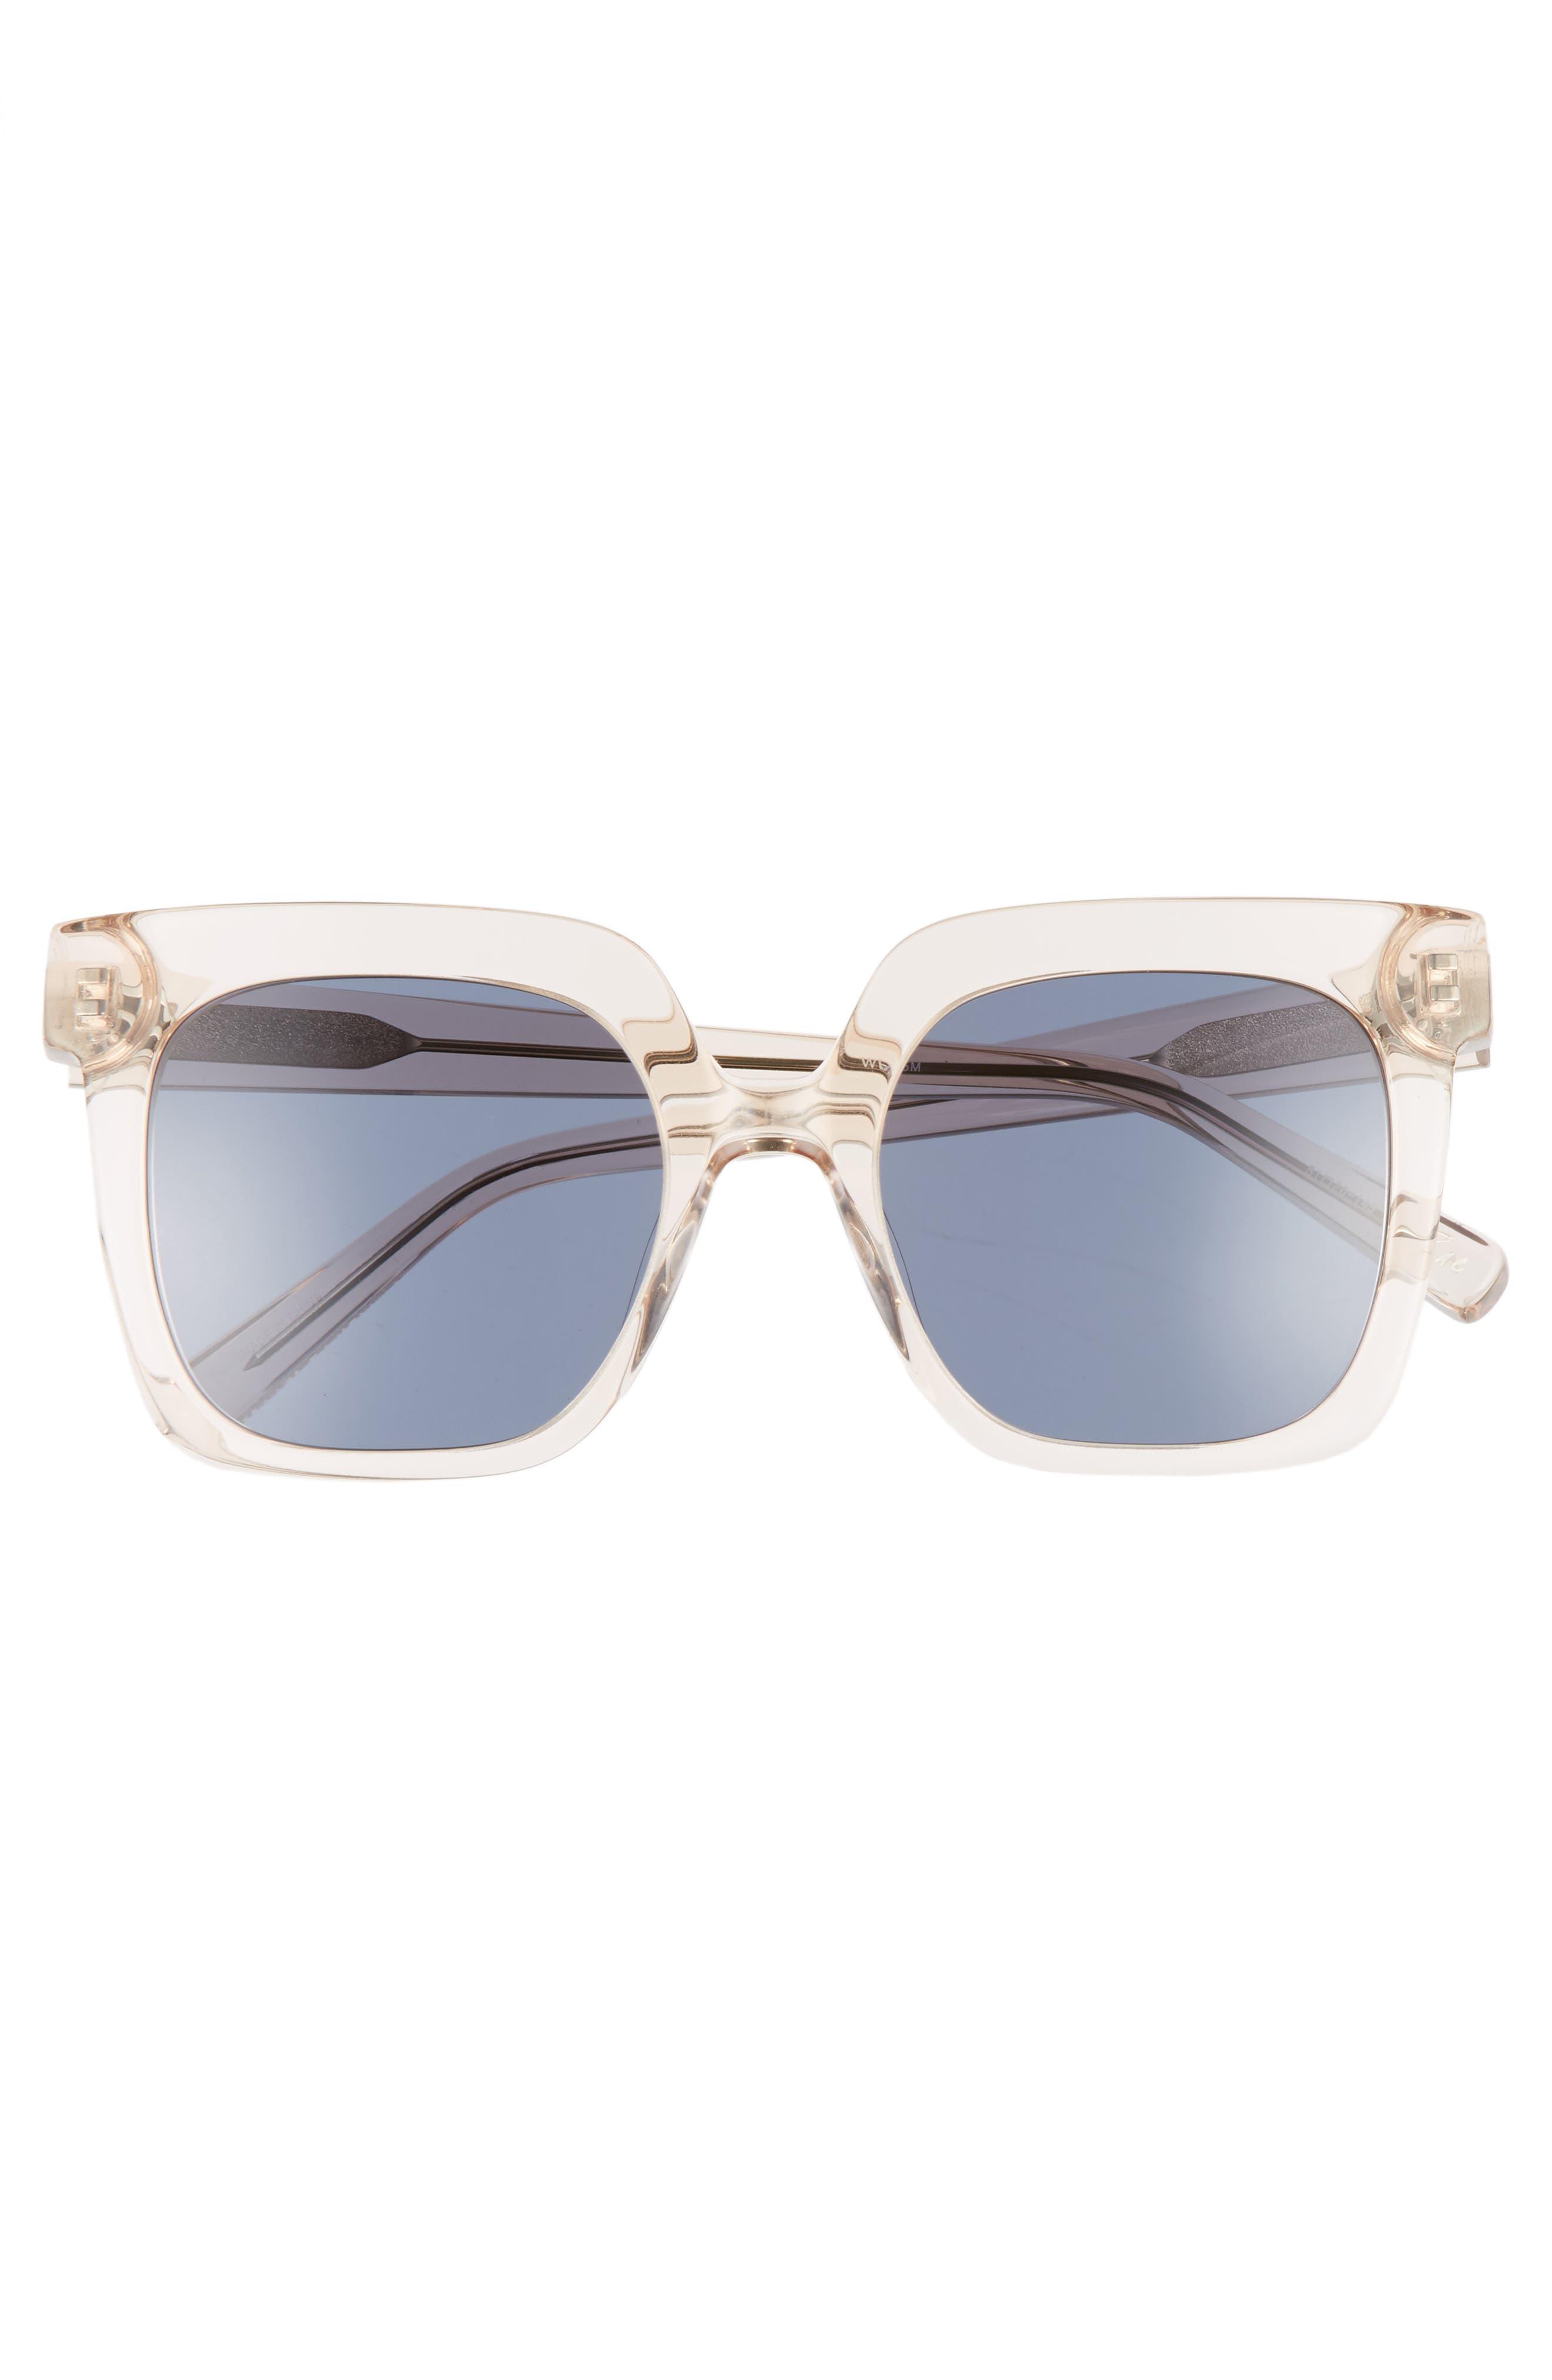 Rae 51mm Square Sunglasses,                             Alternate thumbnail 3, color,                             Crystal Tea